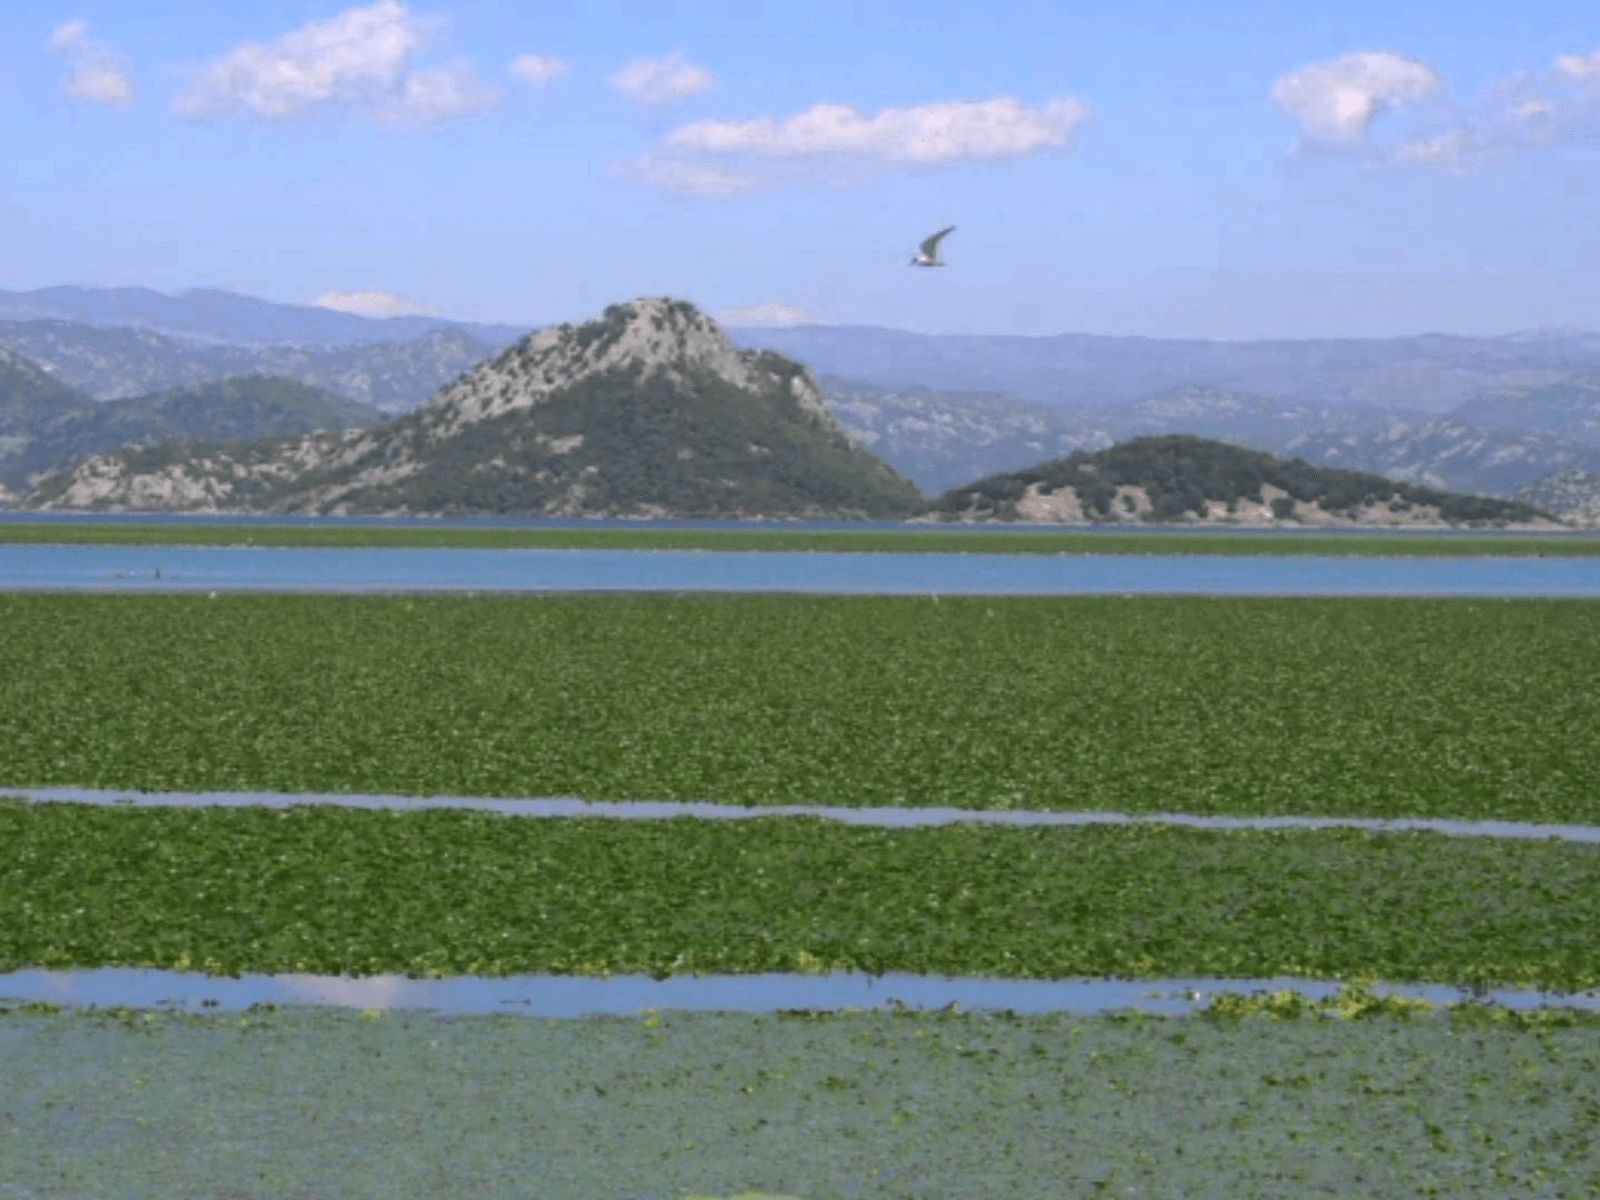 BALKAN TURA - First Minute!: Albanija i Crna Gora: Skadarsko jezero